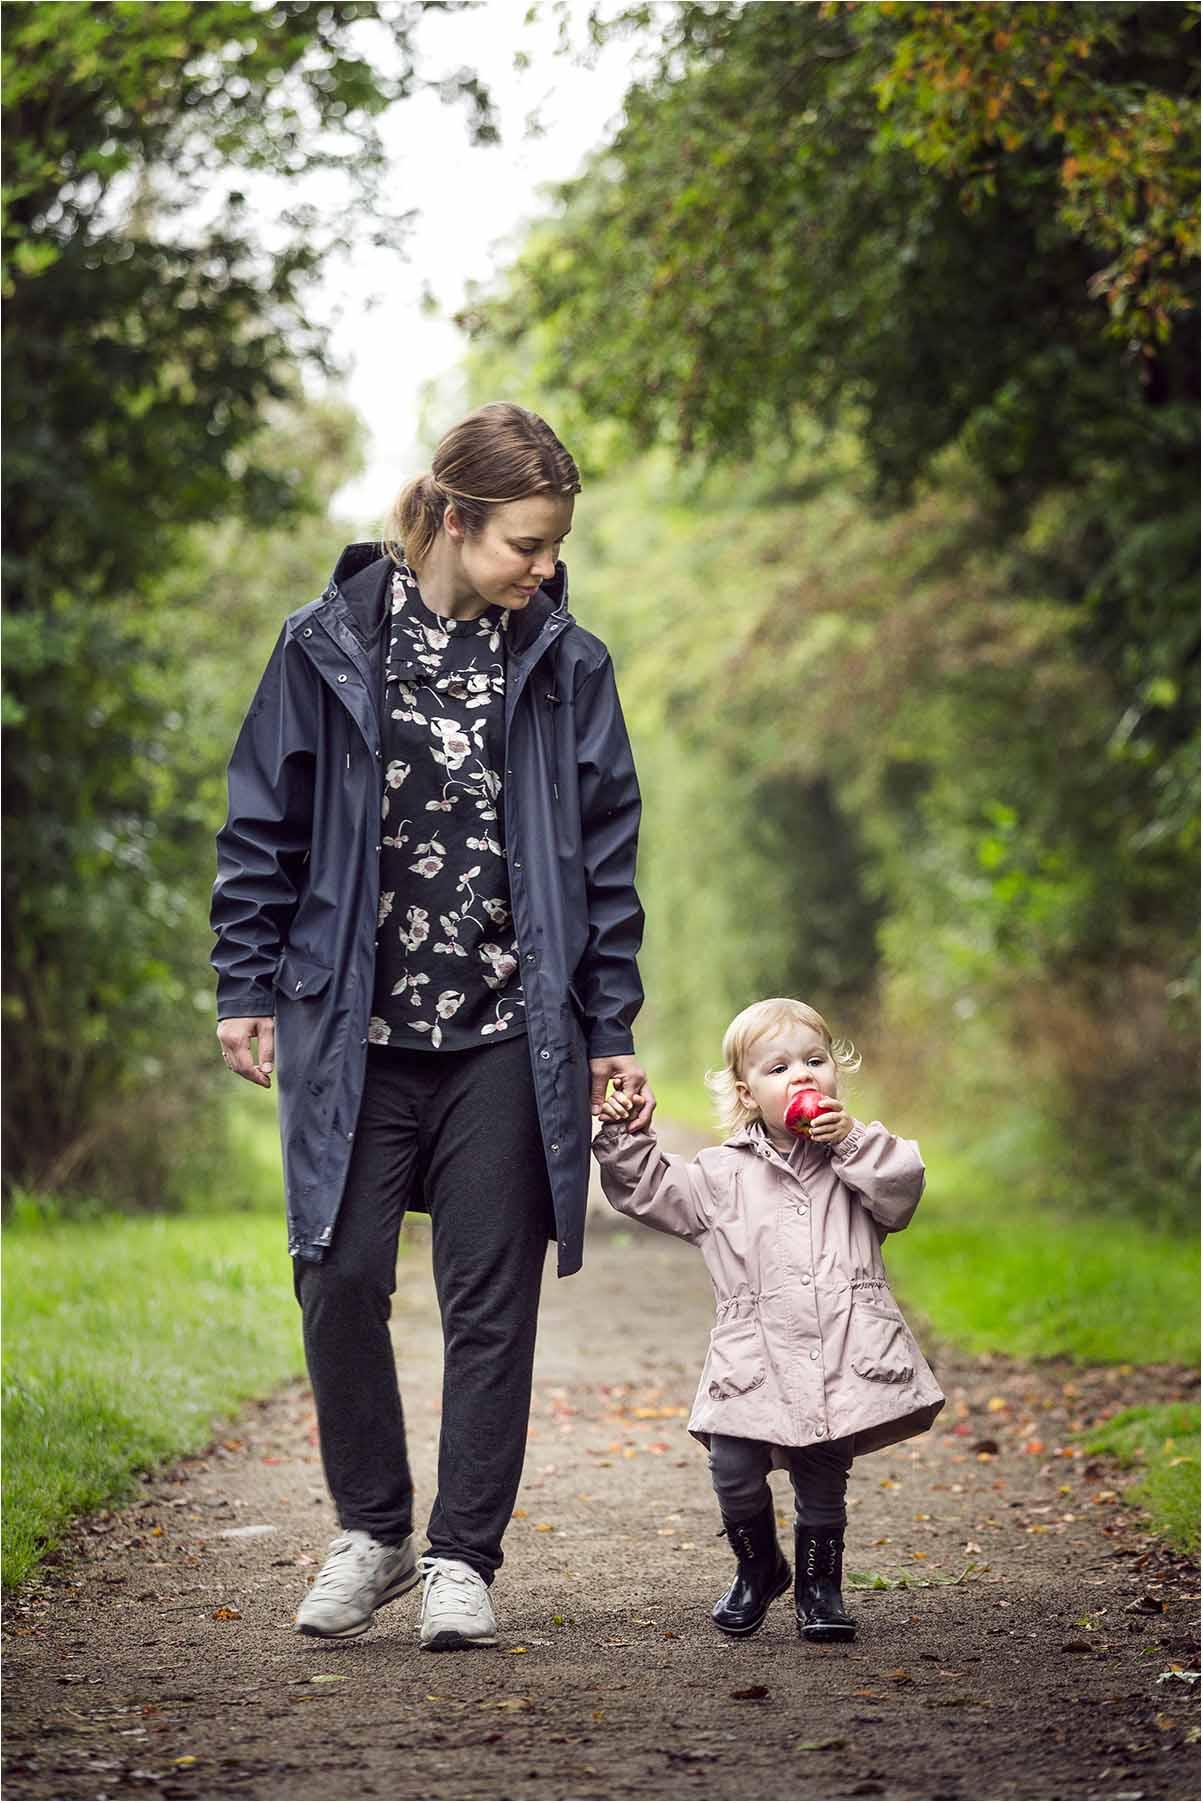 børnefotografer Kolding